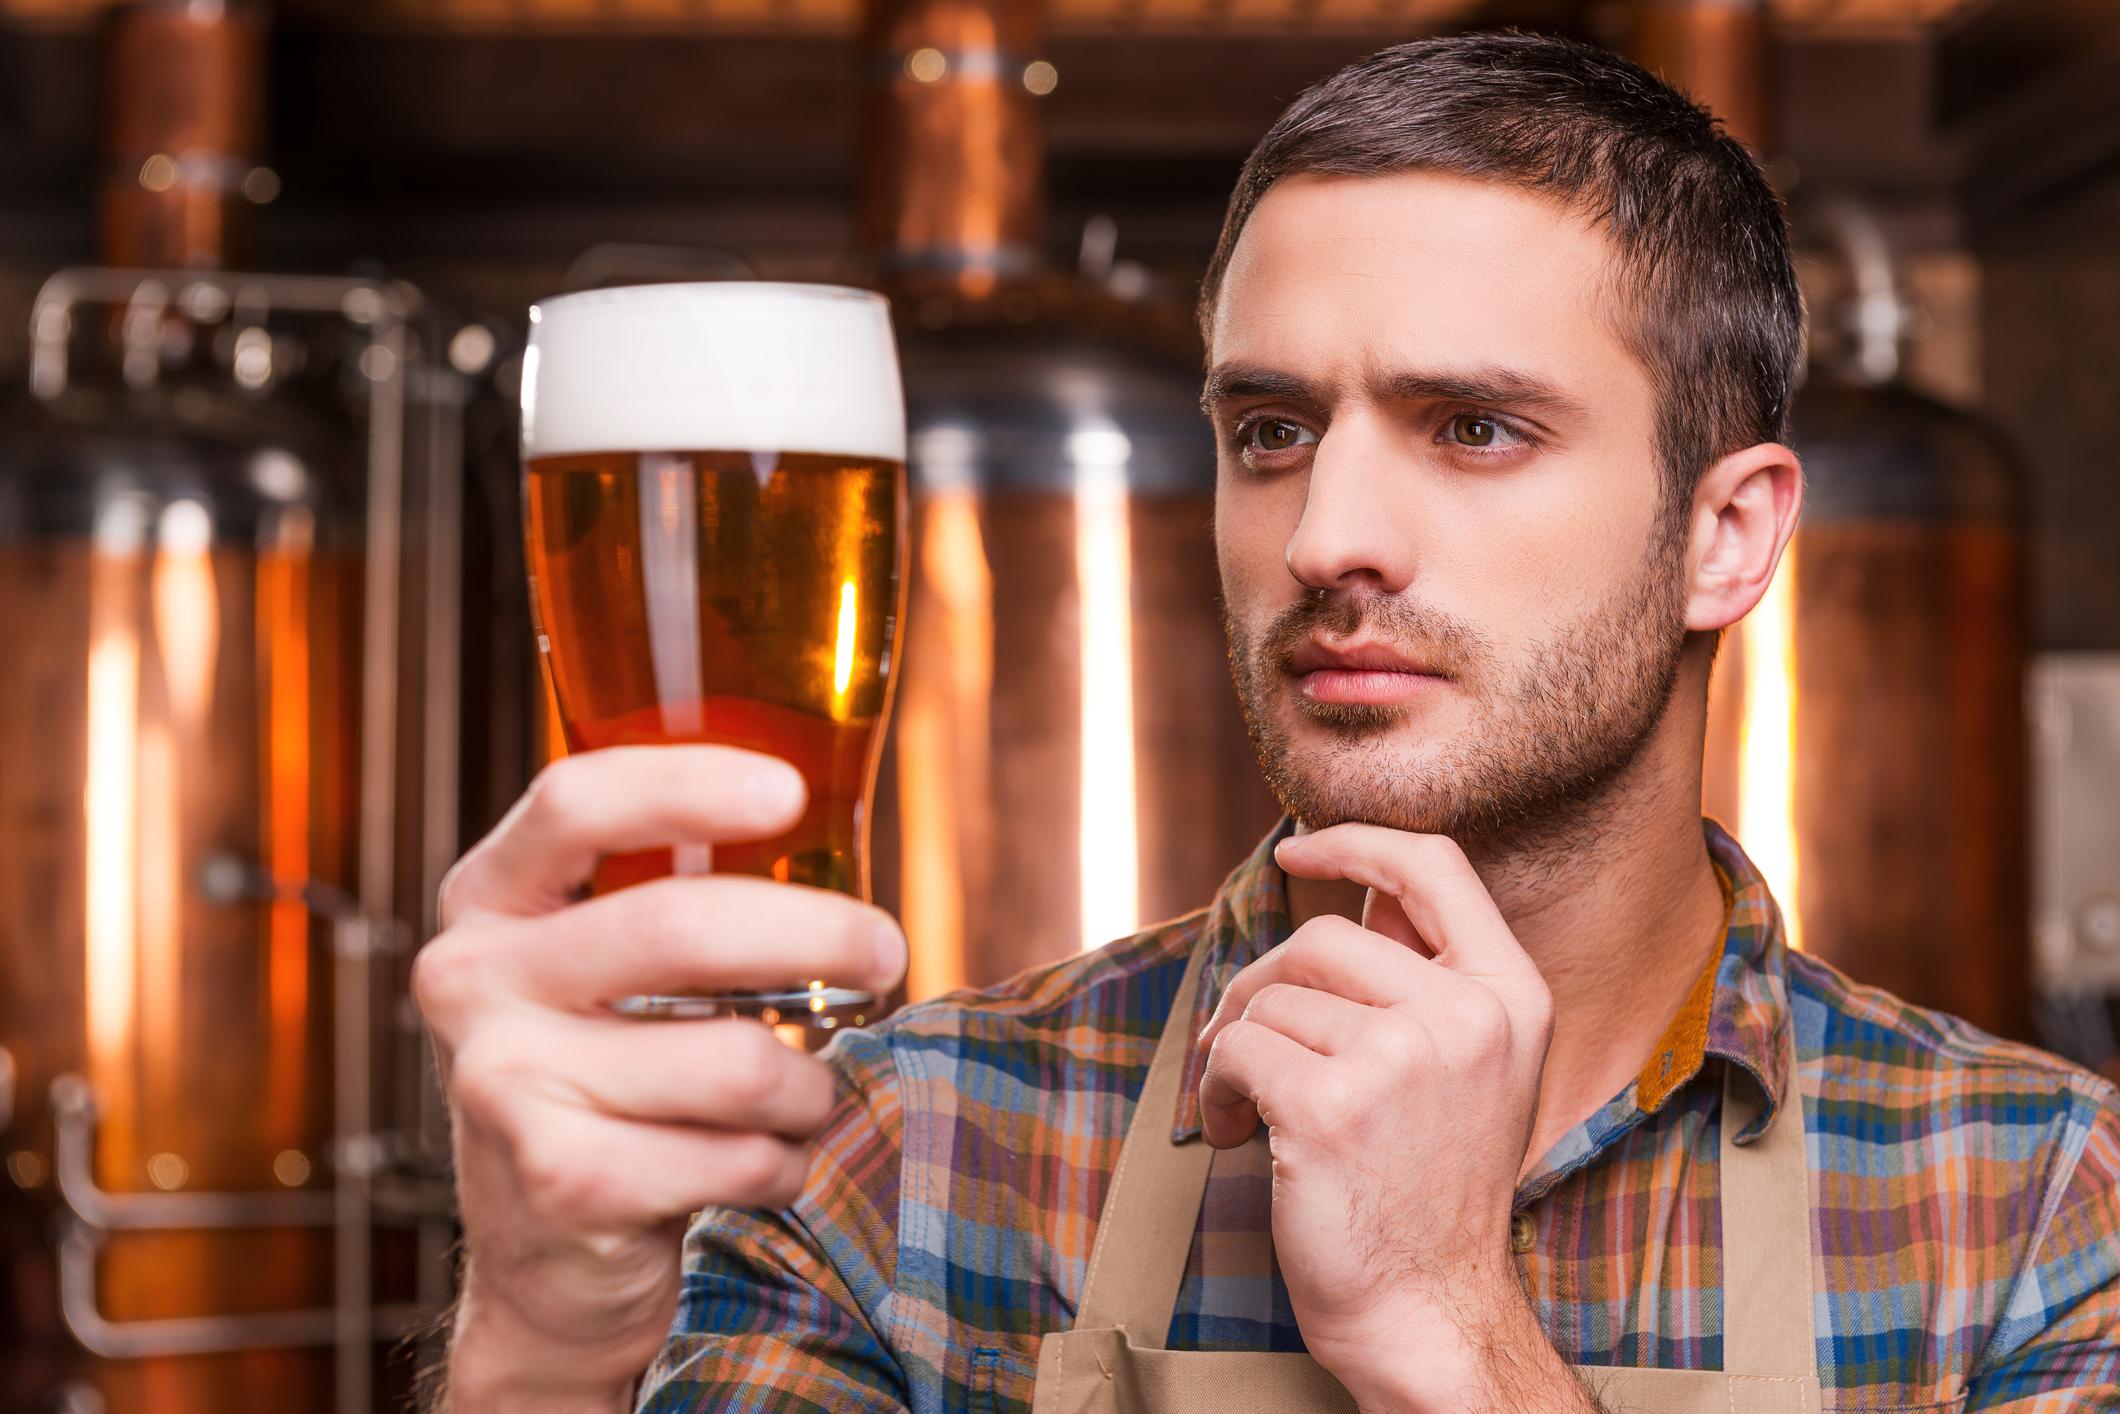 3 Marijuana Stocks That Are the Likeliest to Land a Big Alcohol Partnership Next